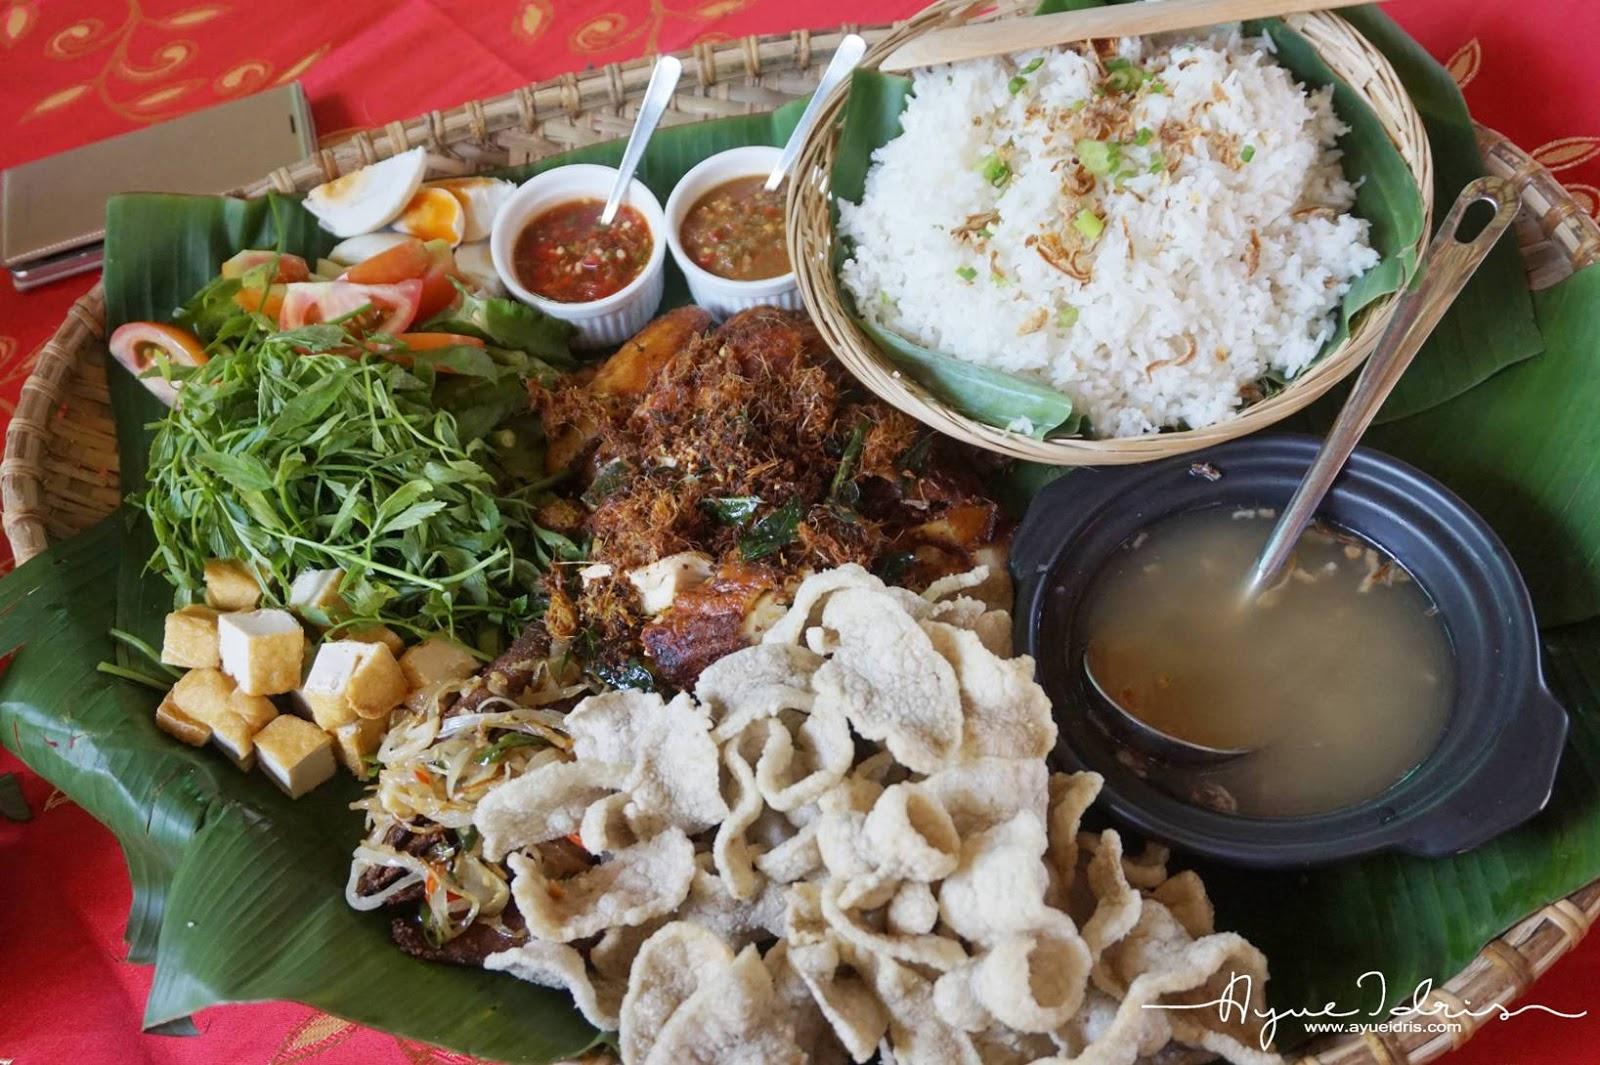 resepi ayam bakar ala kampung resepi book Resepi Ayam Bakar Nasi Kerabu Kelantan Enak dan Mudah